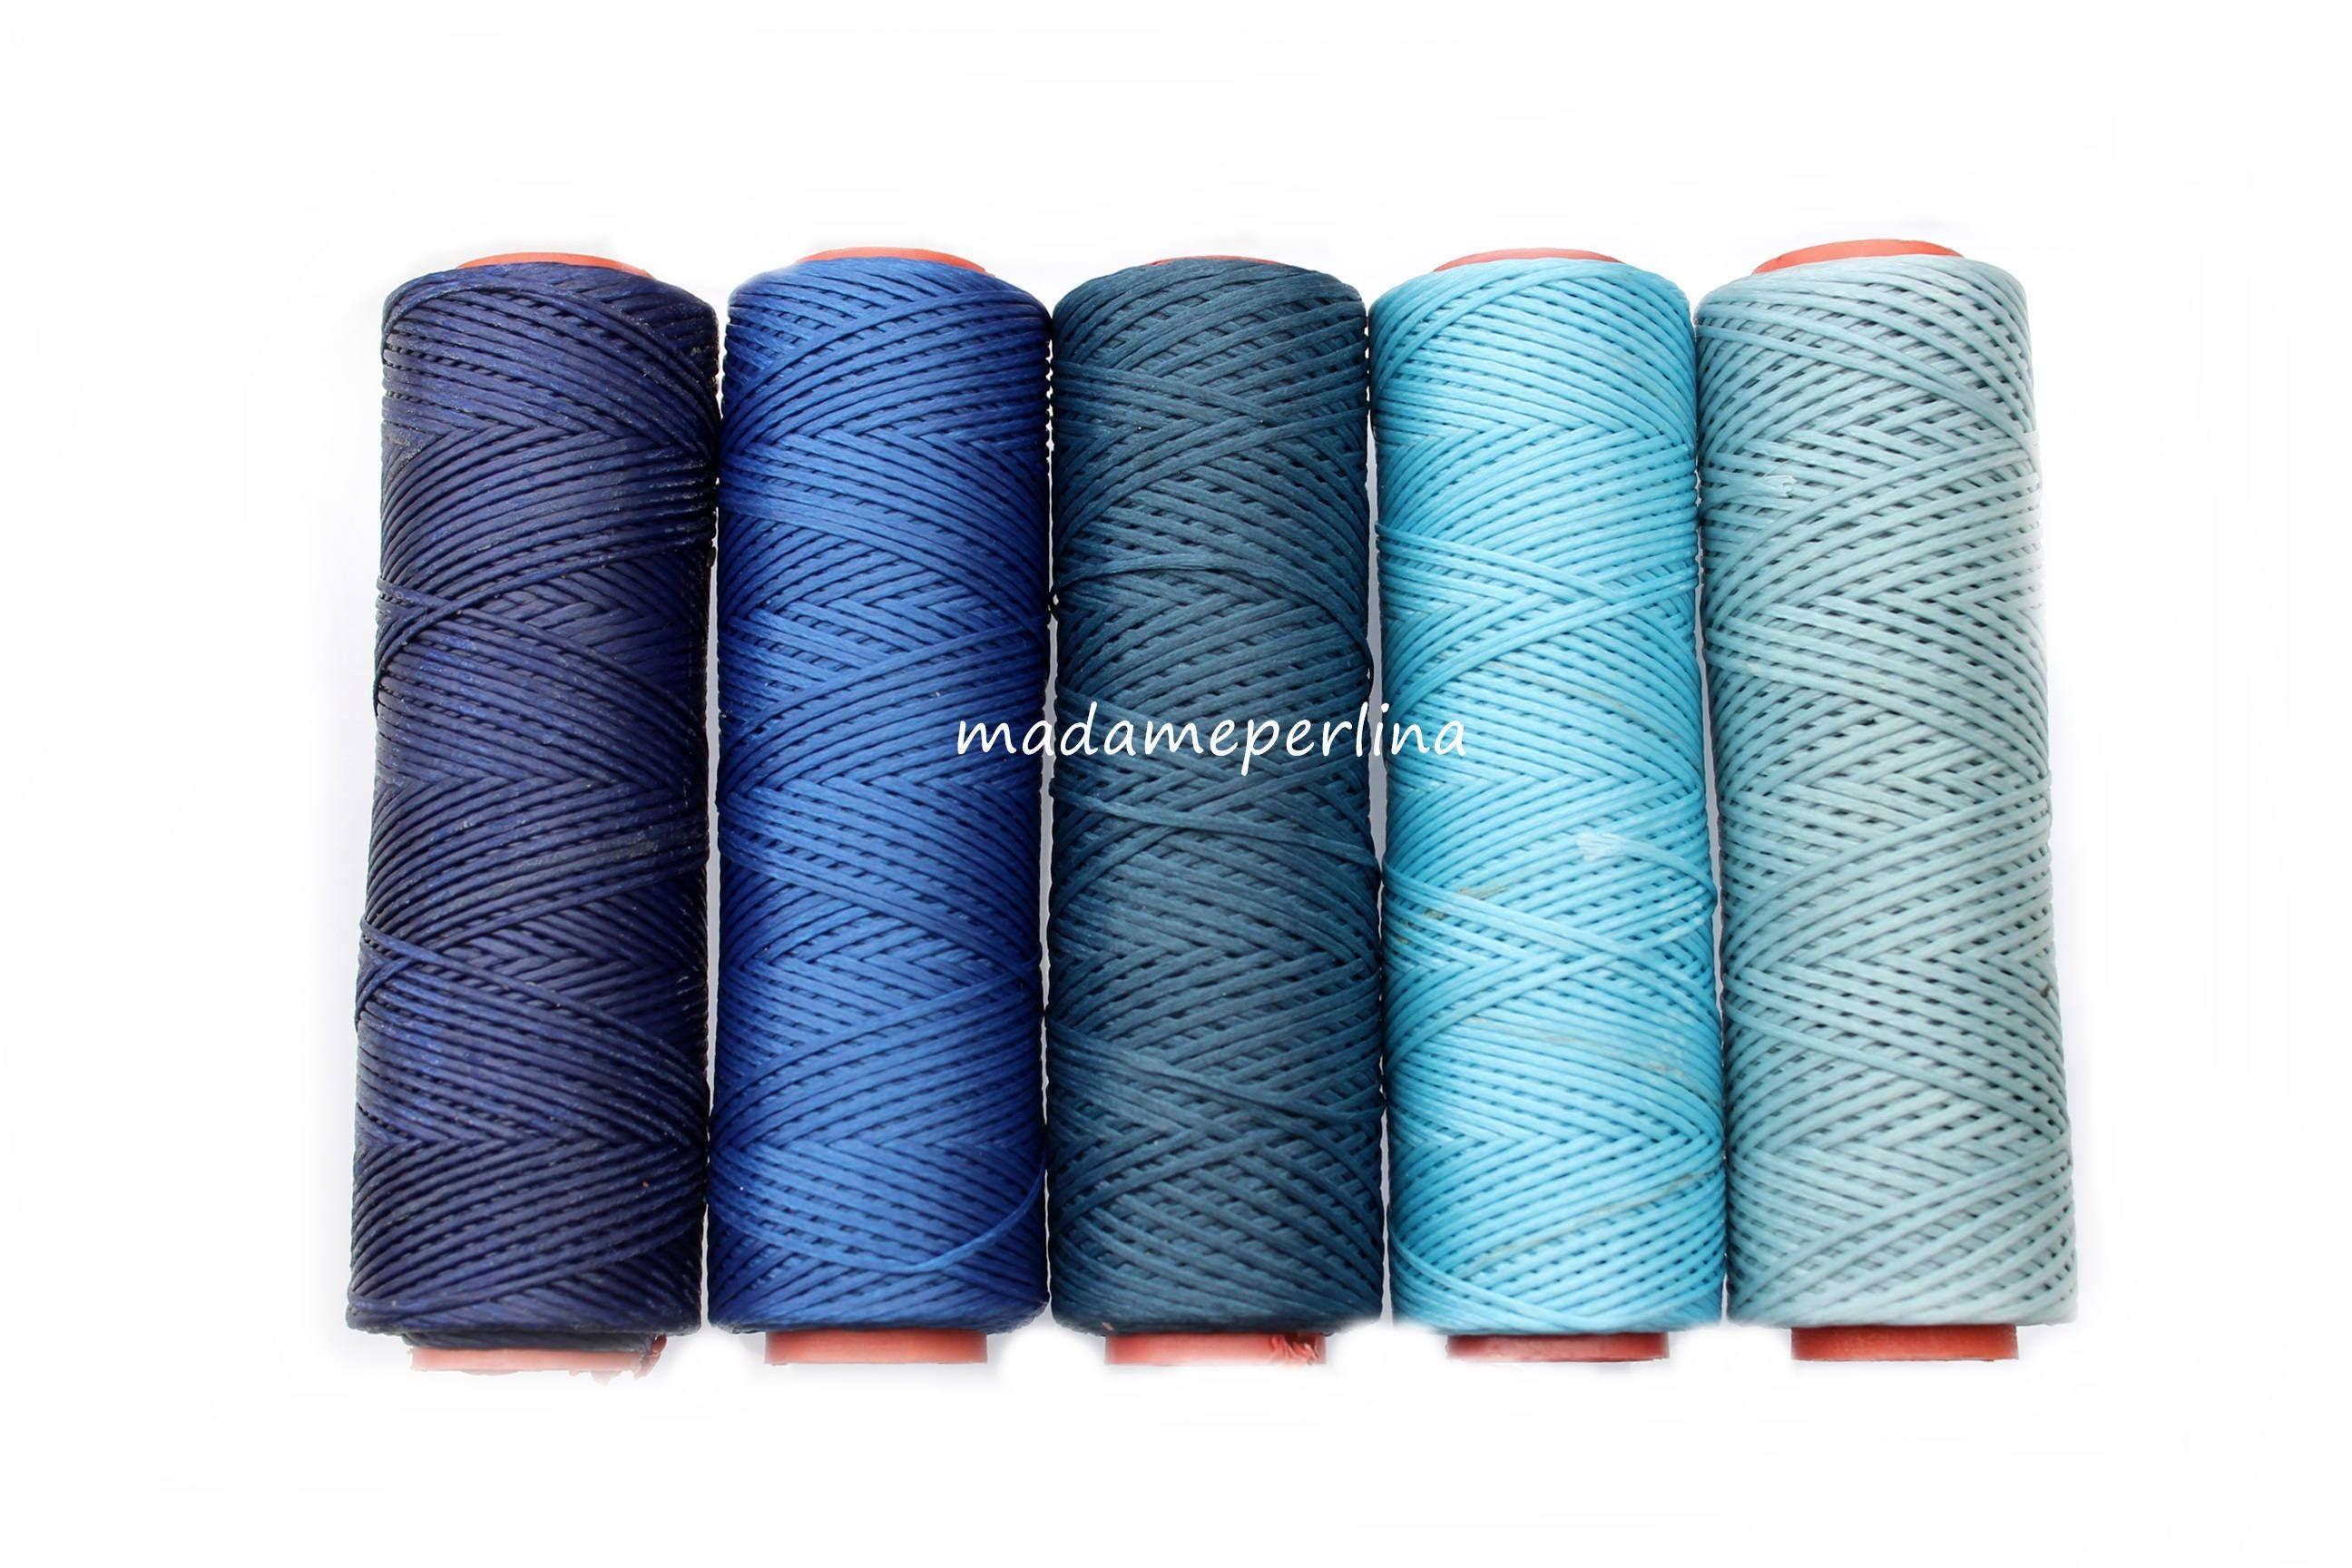 10 Meters 10 93 Yard Wax Cord Waxed Thread 1mm Polyester Macrame Rope Blue Turkish Jewellery Supplies Findings Lotb Turkish Jewelry Jewelry Supplies Jewelry